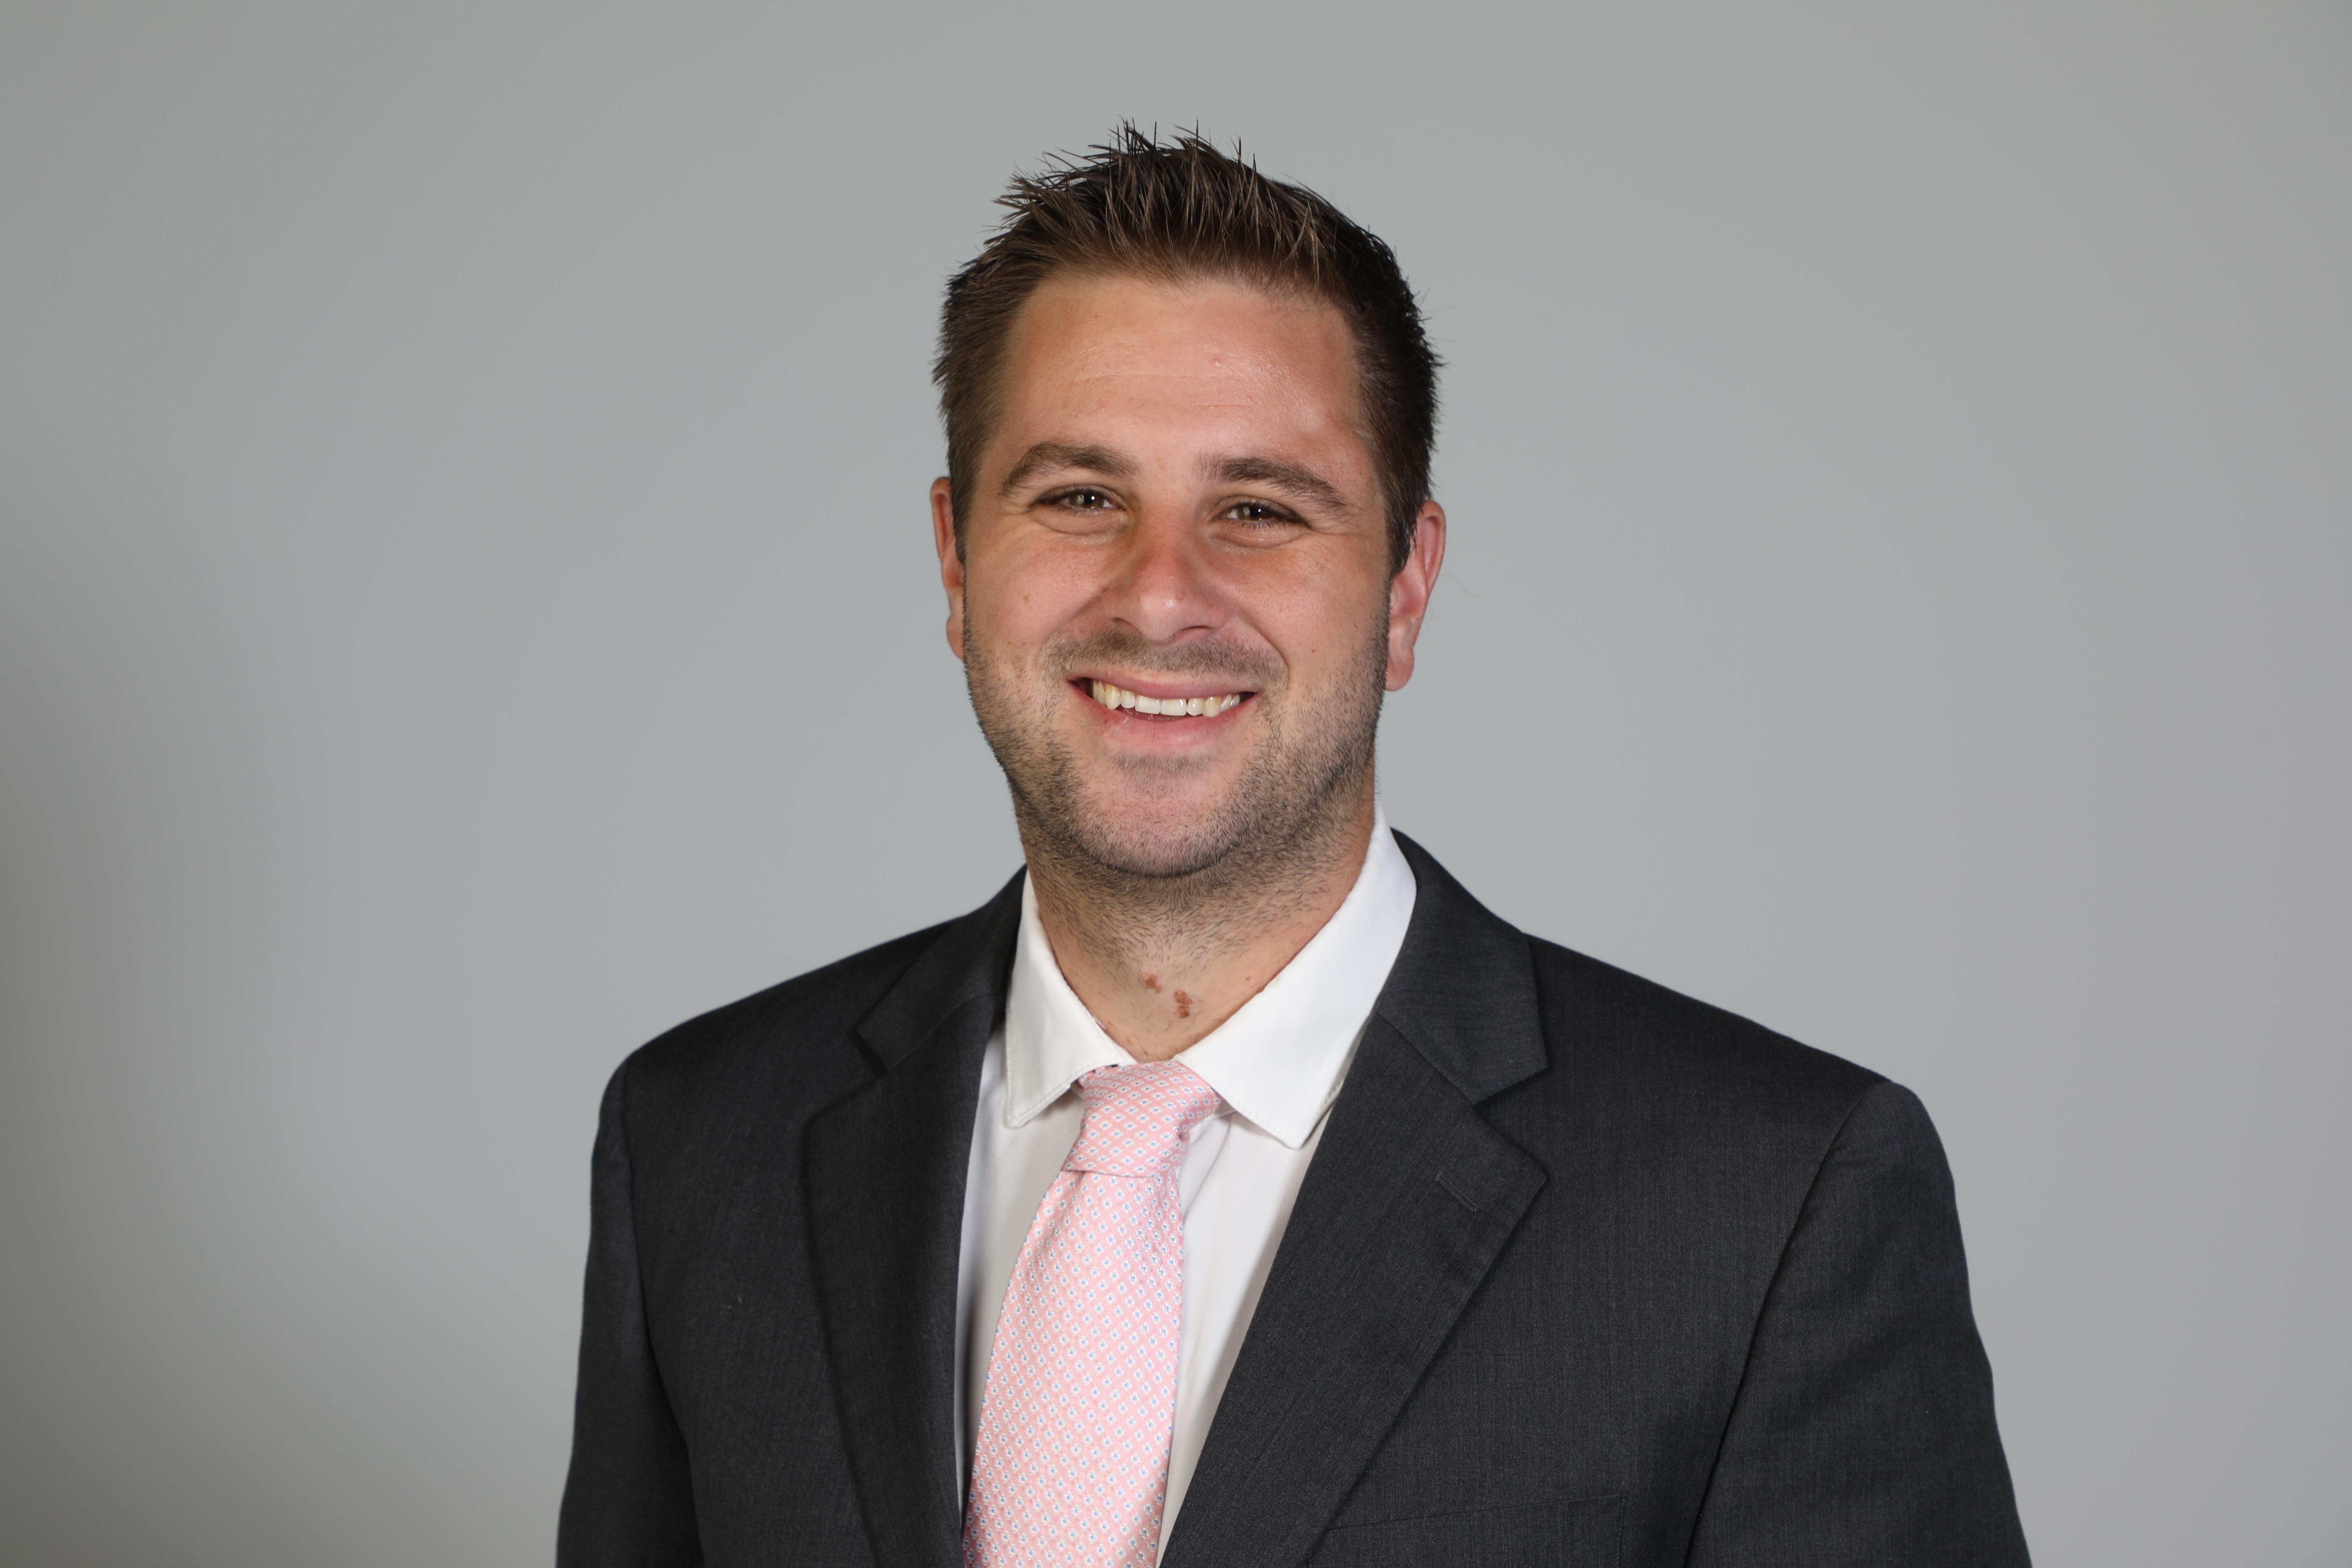 Sean Strehlow